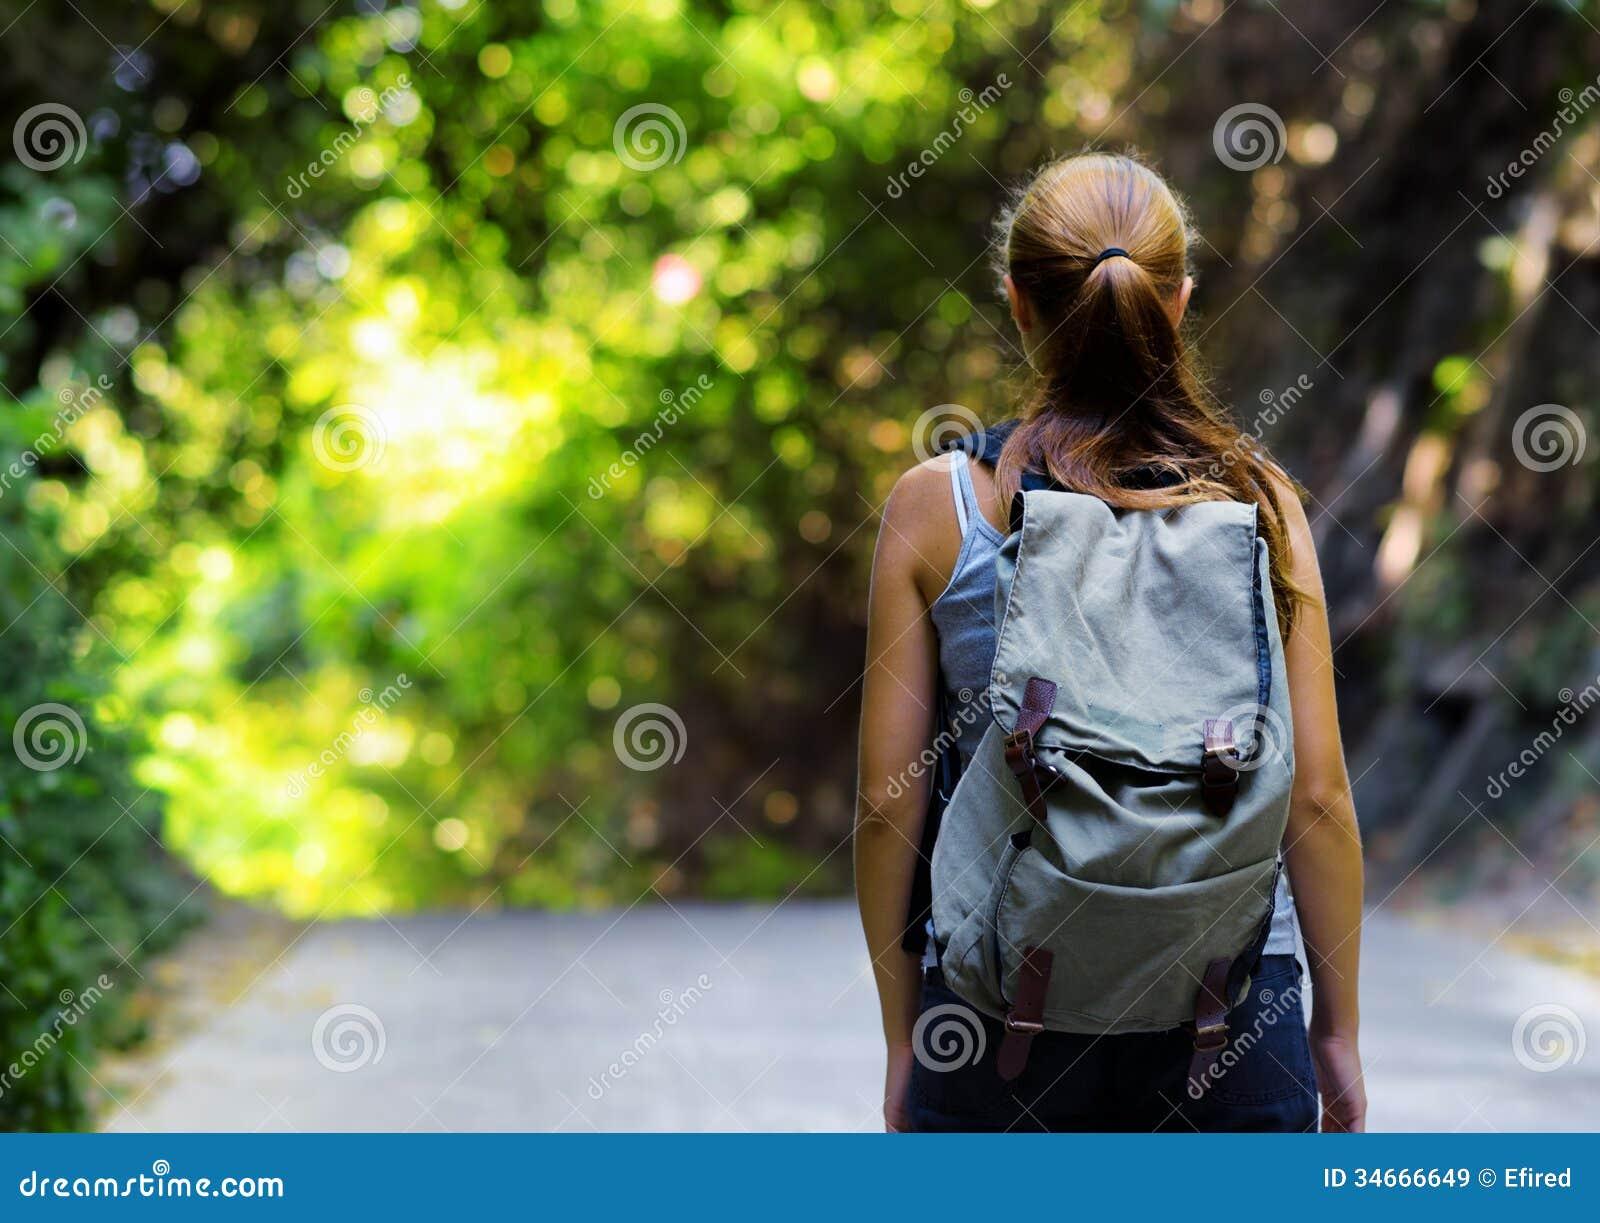 September, 2014 | Frog Backpack